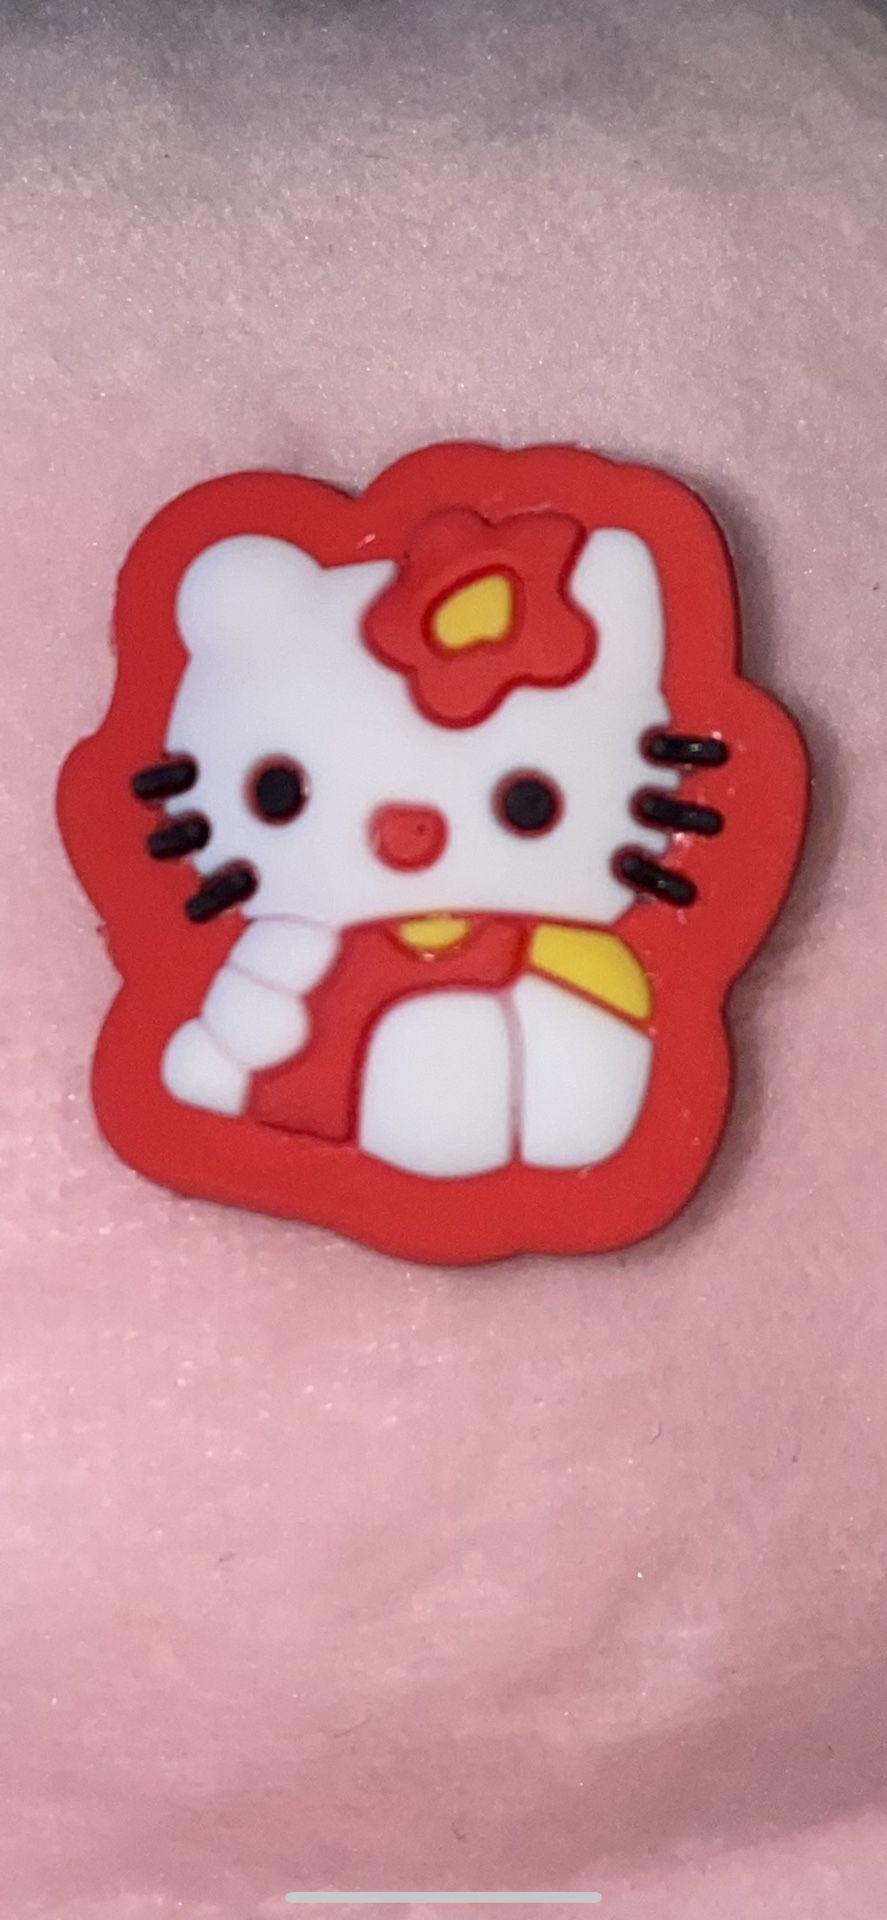 hello Kitty gibbets for crocs🥰 charms